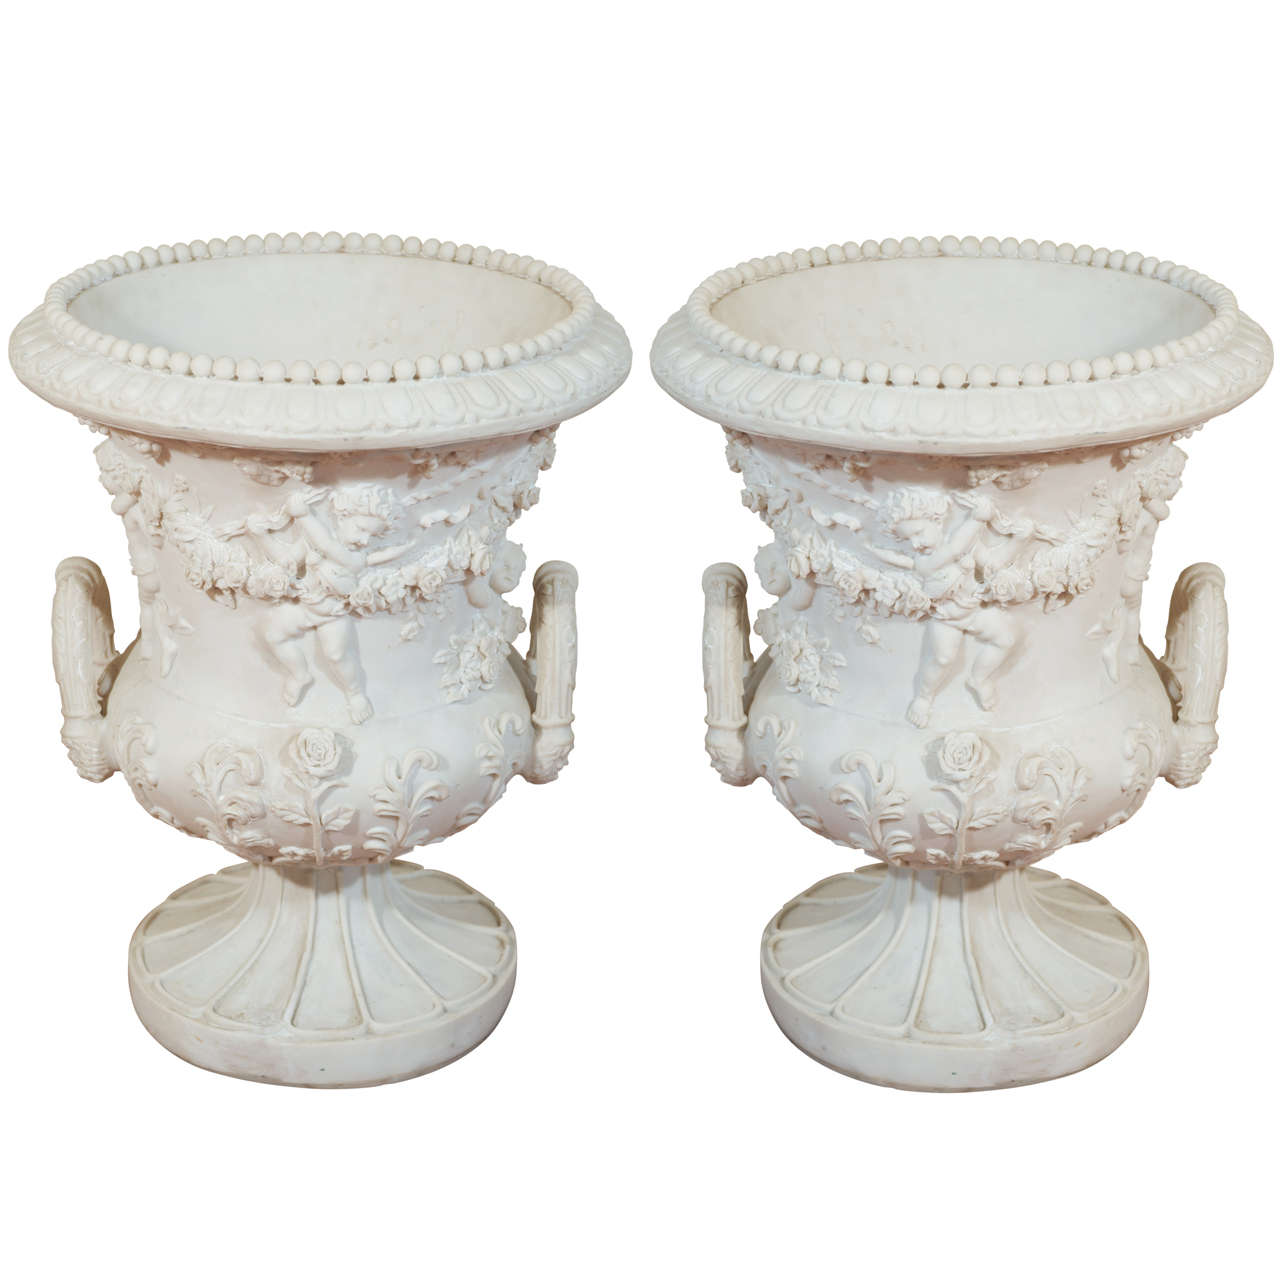 Louis Xv Style Ornate Resin Urns At 1stdibs